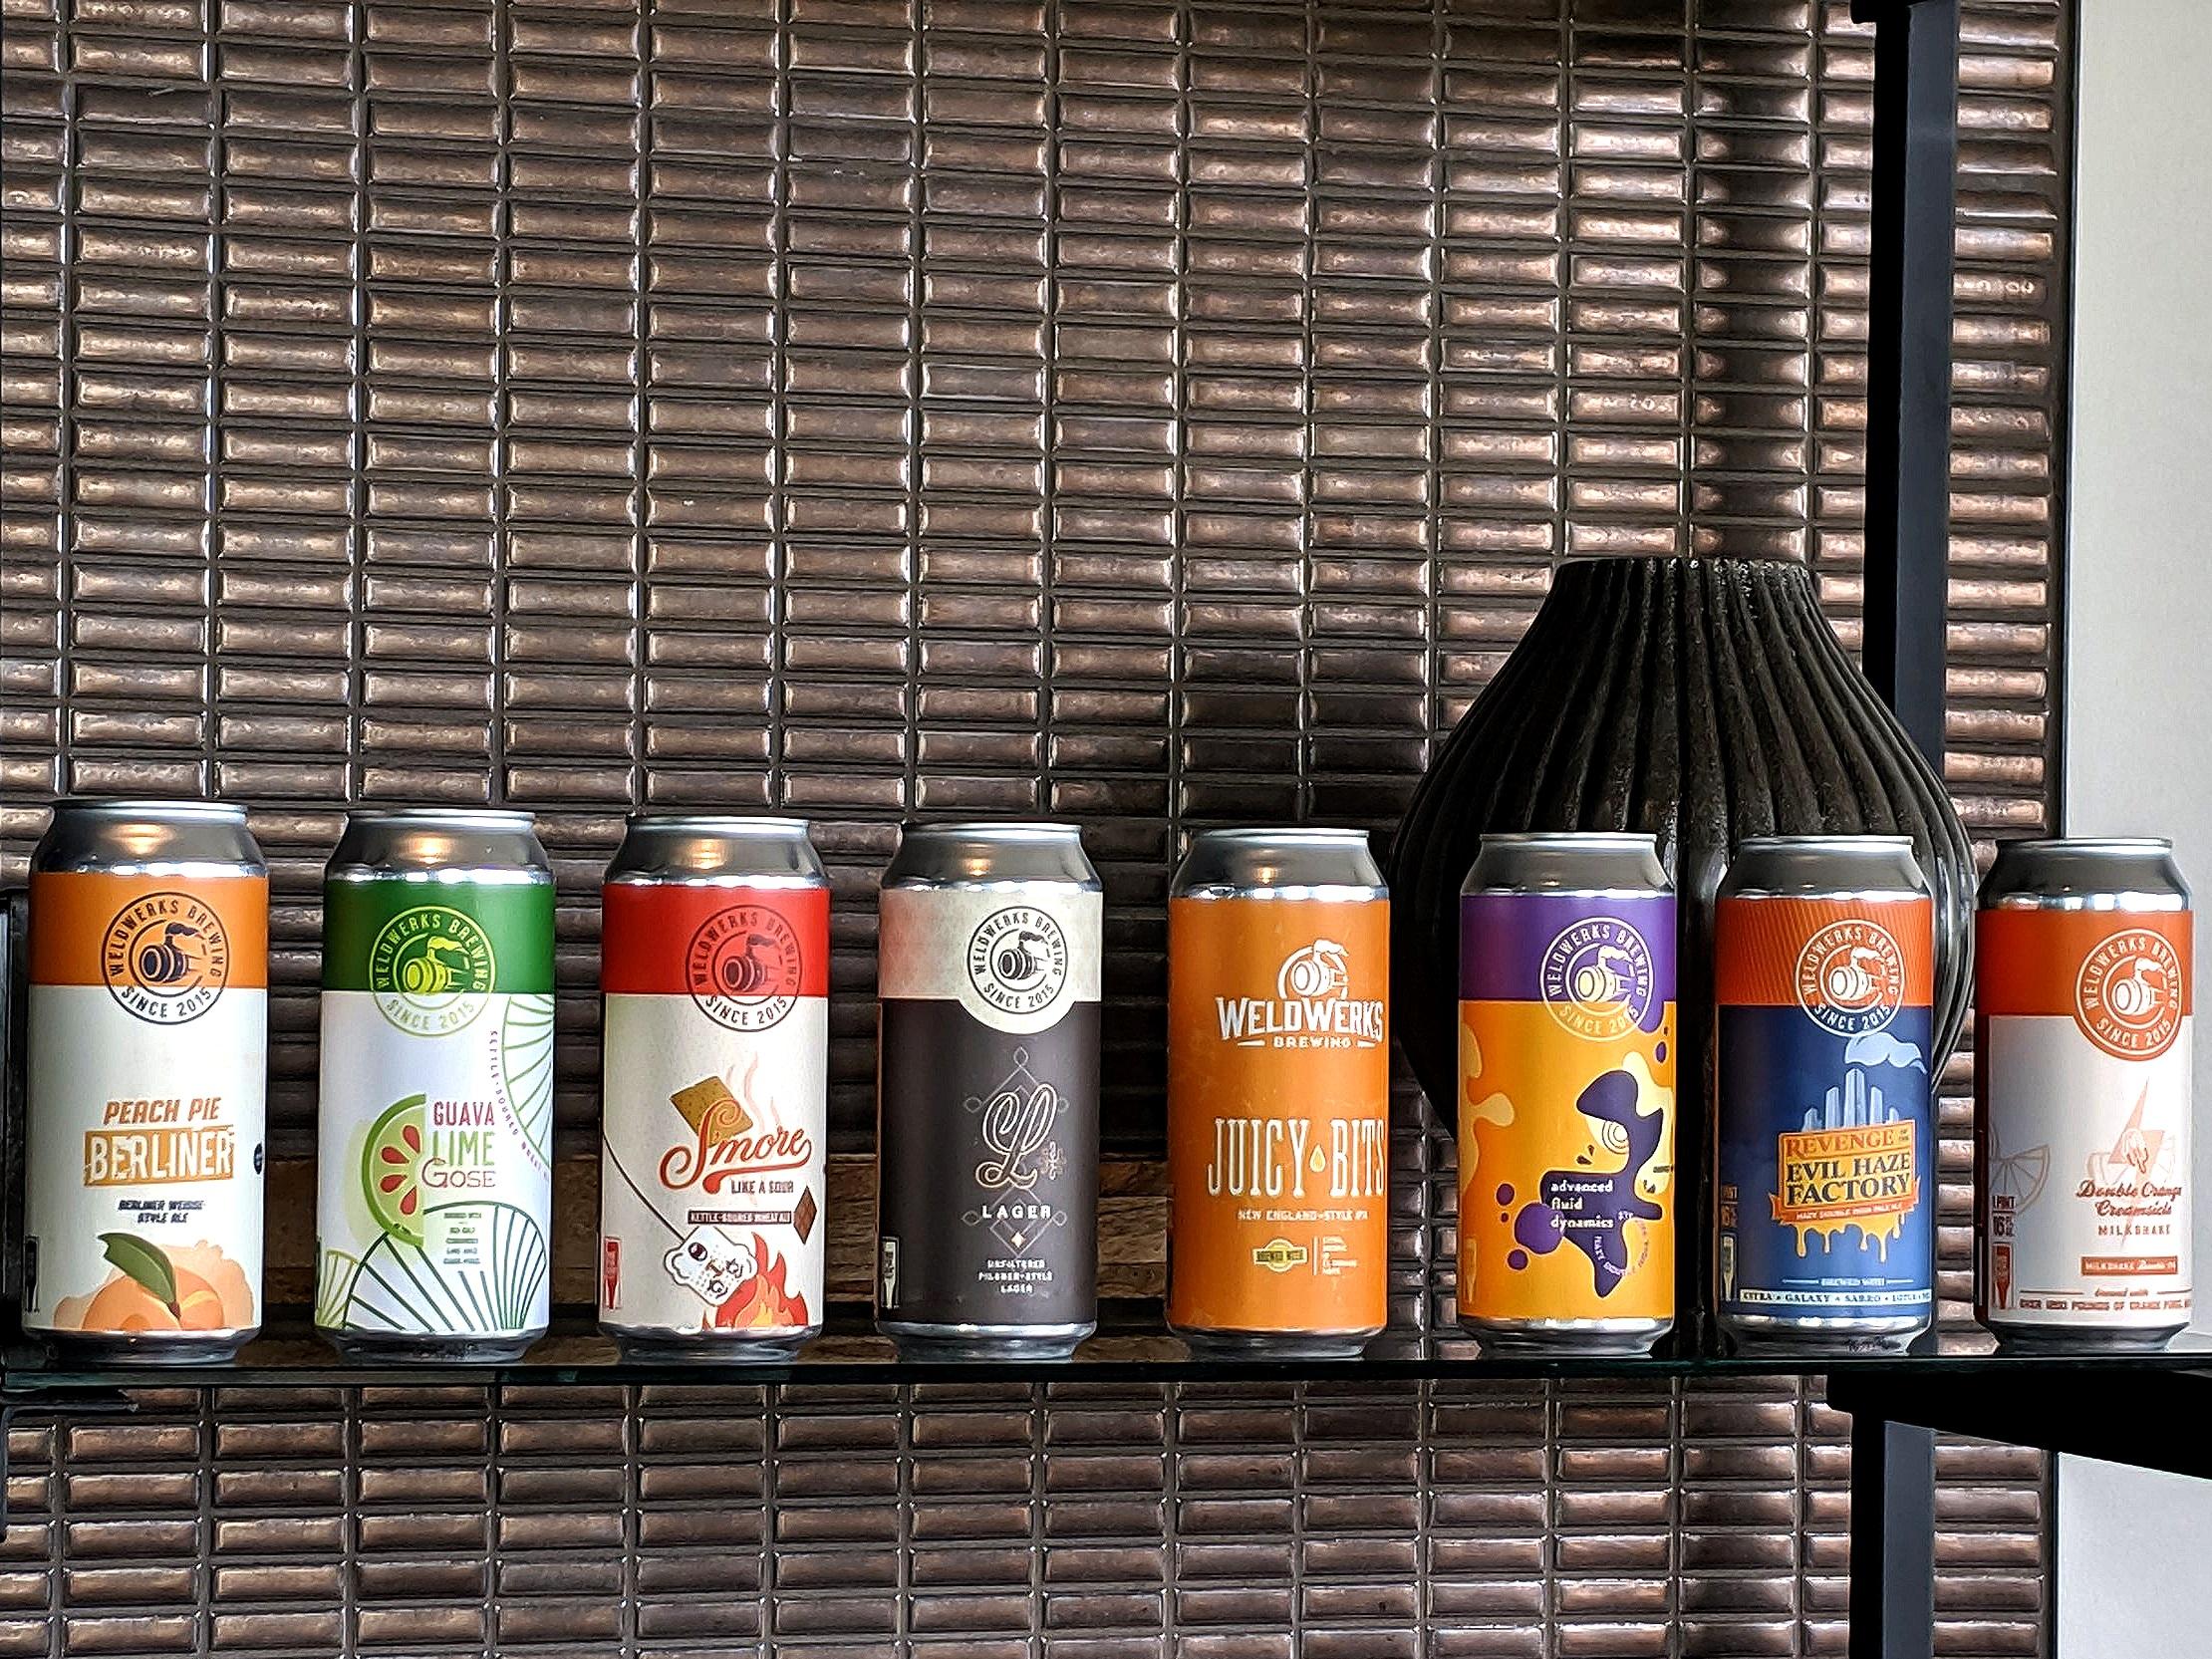 Weldwerks Invitational To-Go Beers Were Amazing